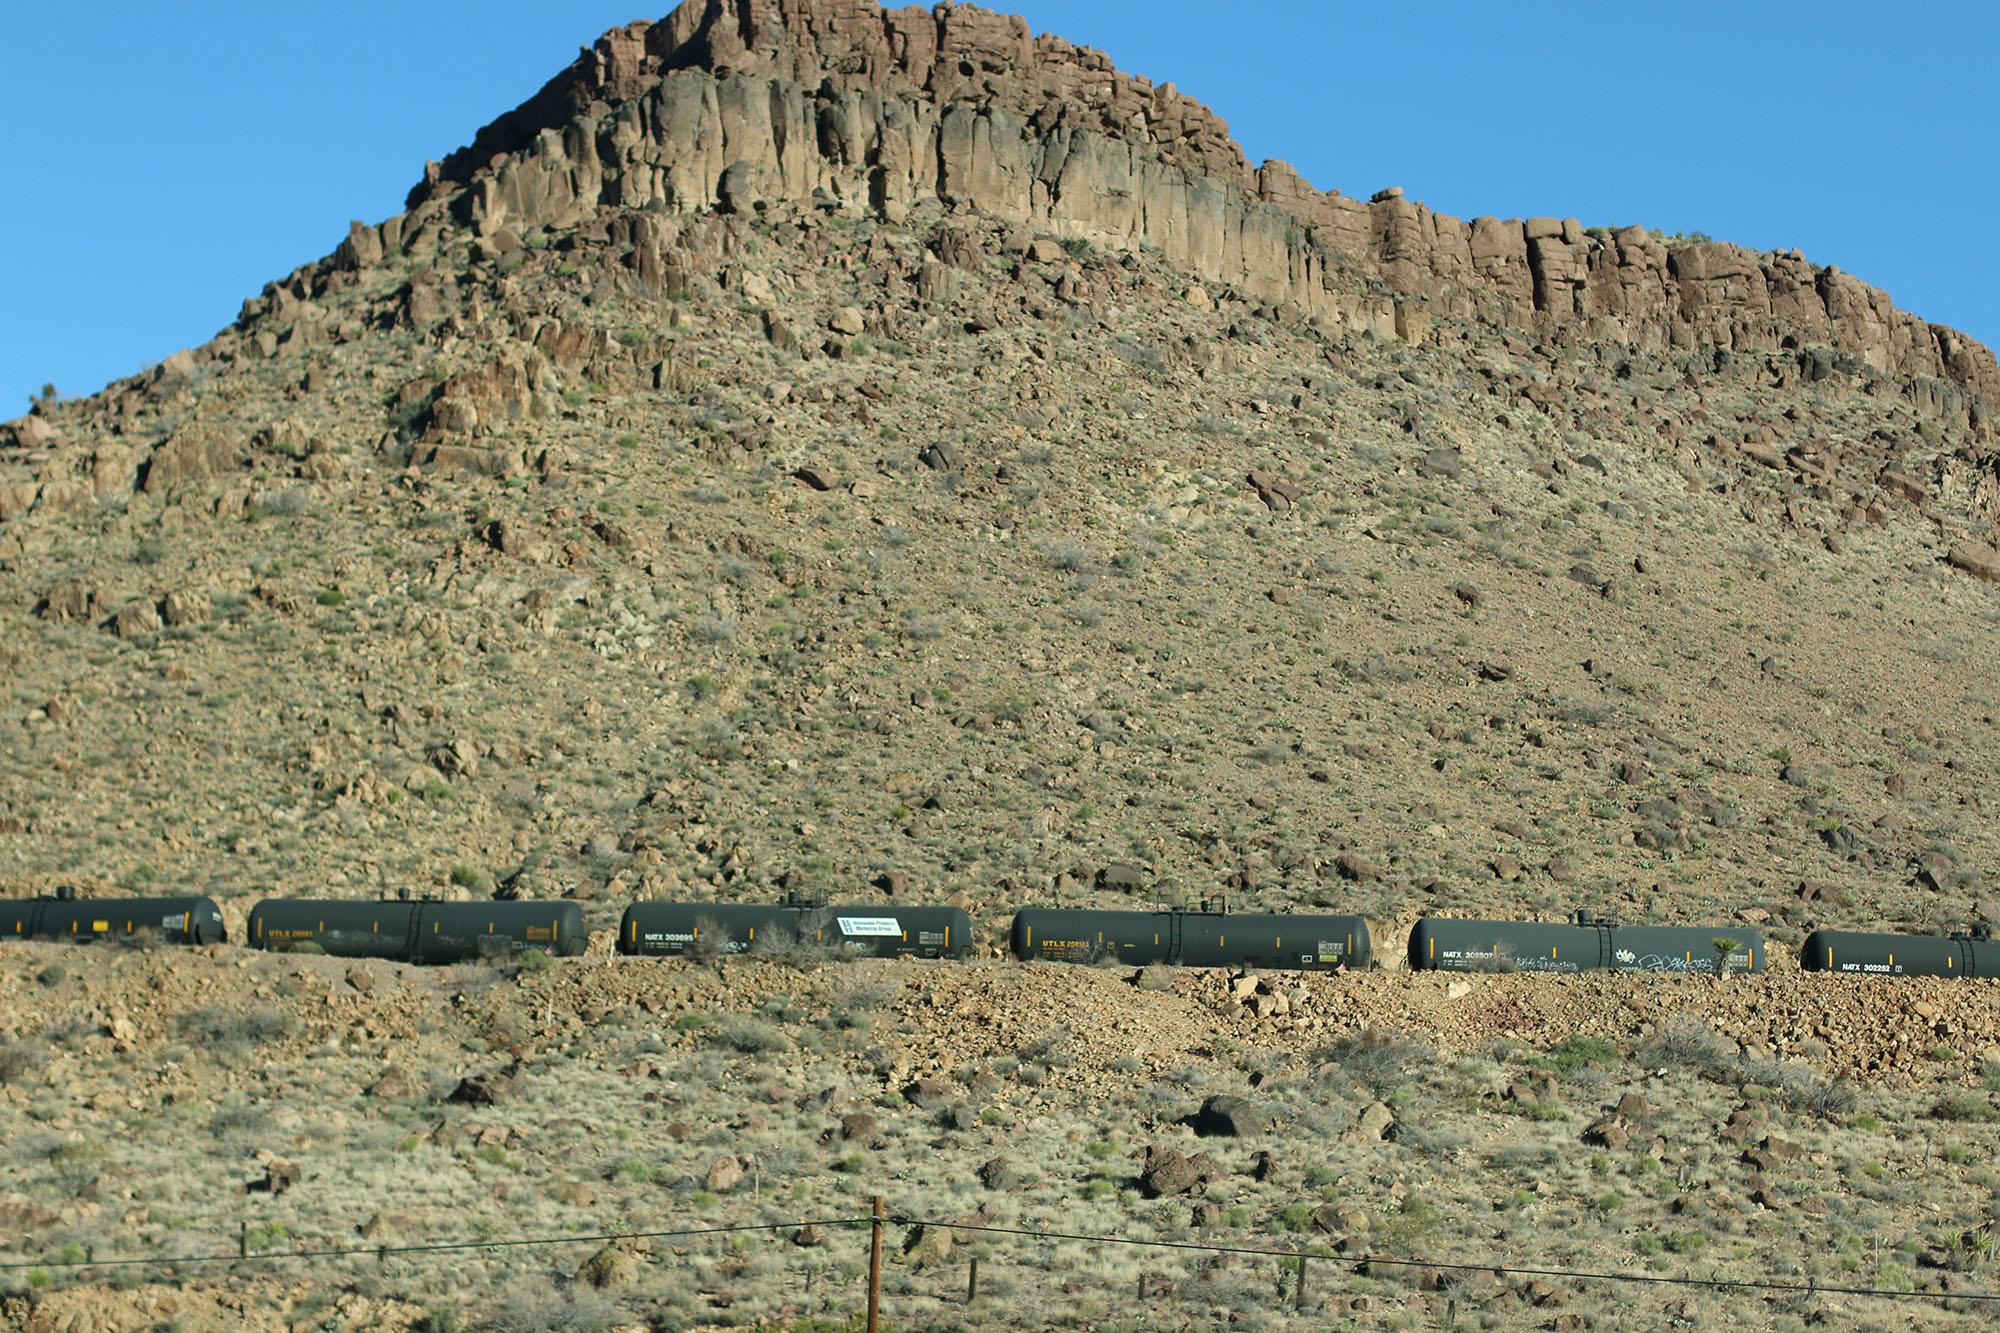 IMG_1530 arizona tåg